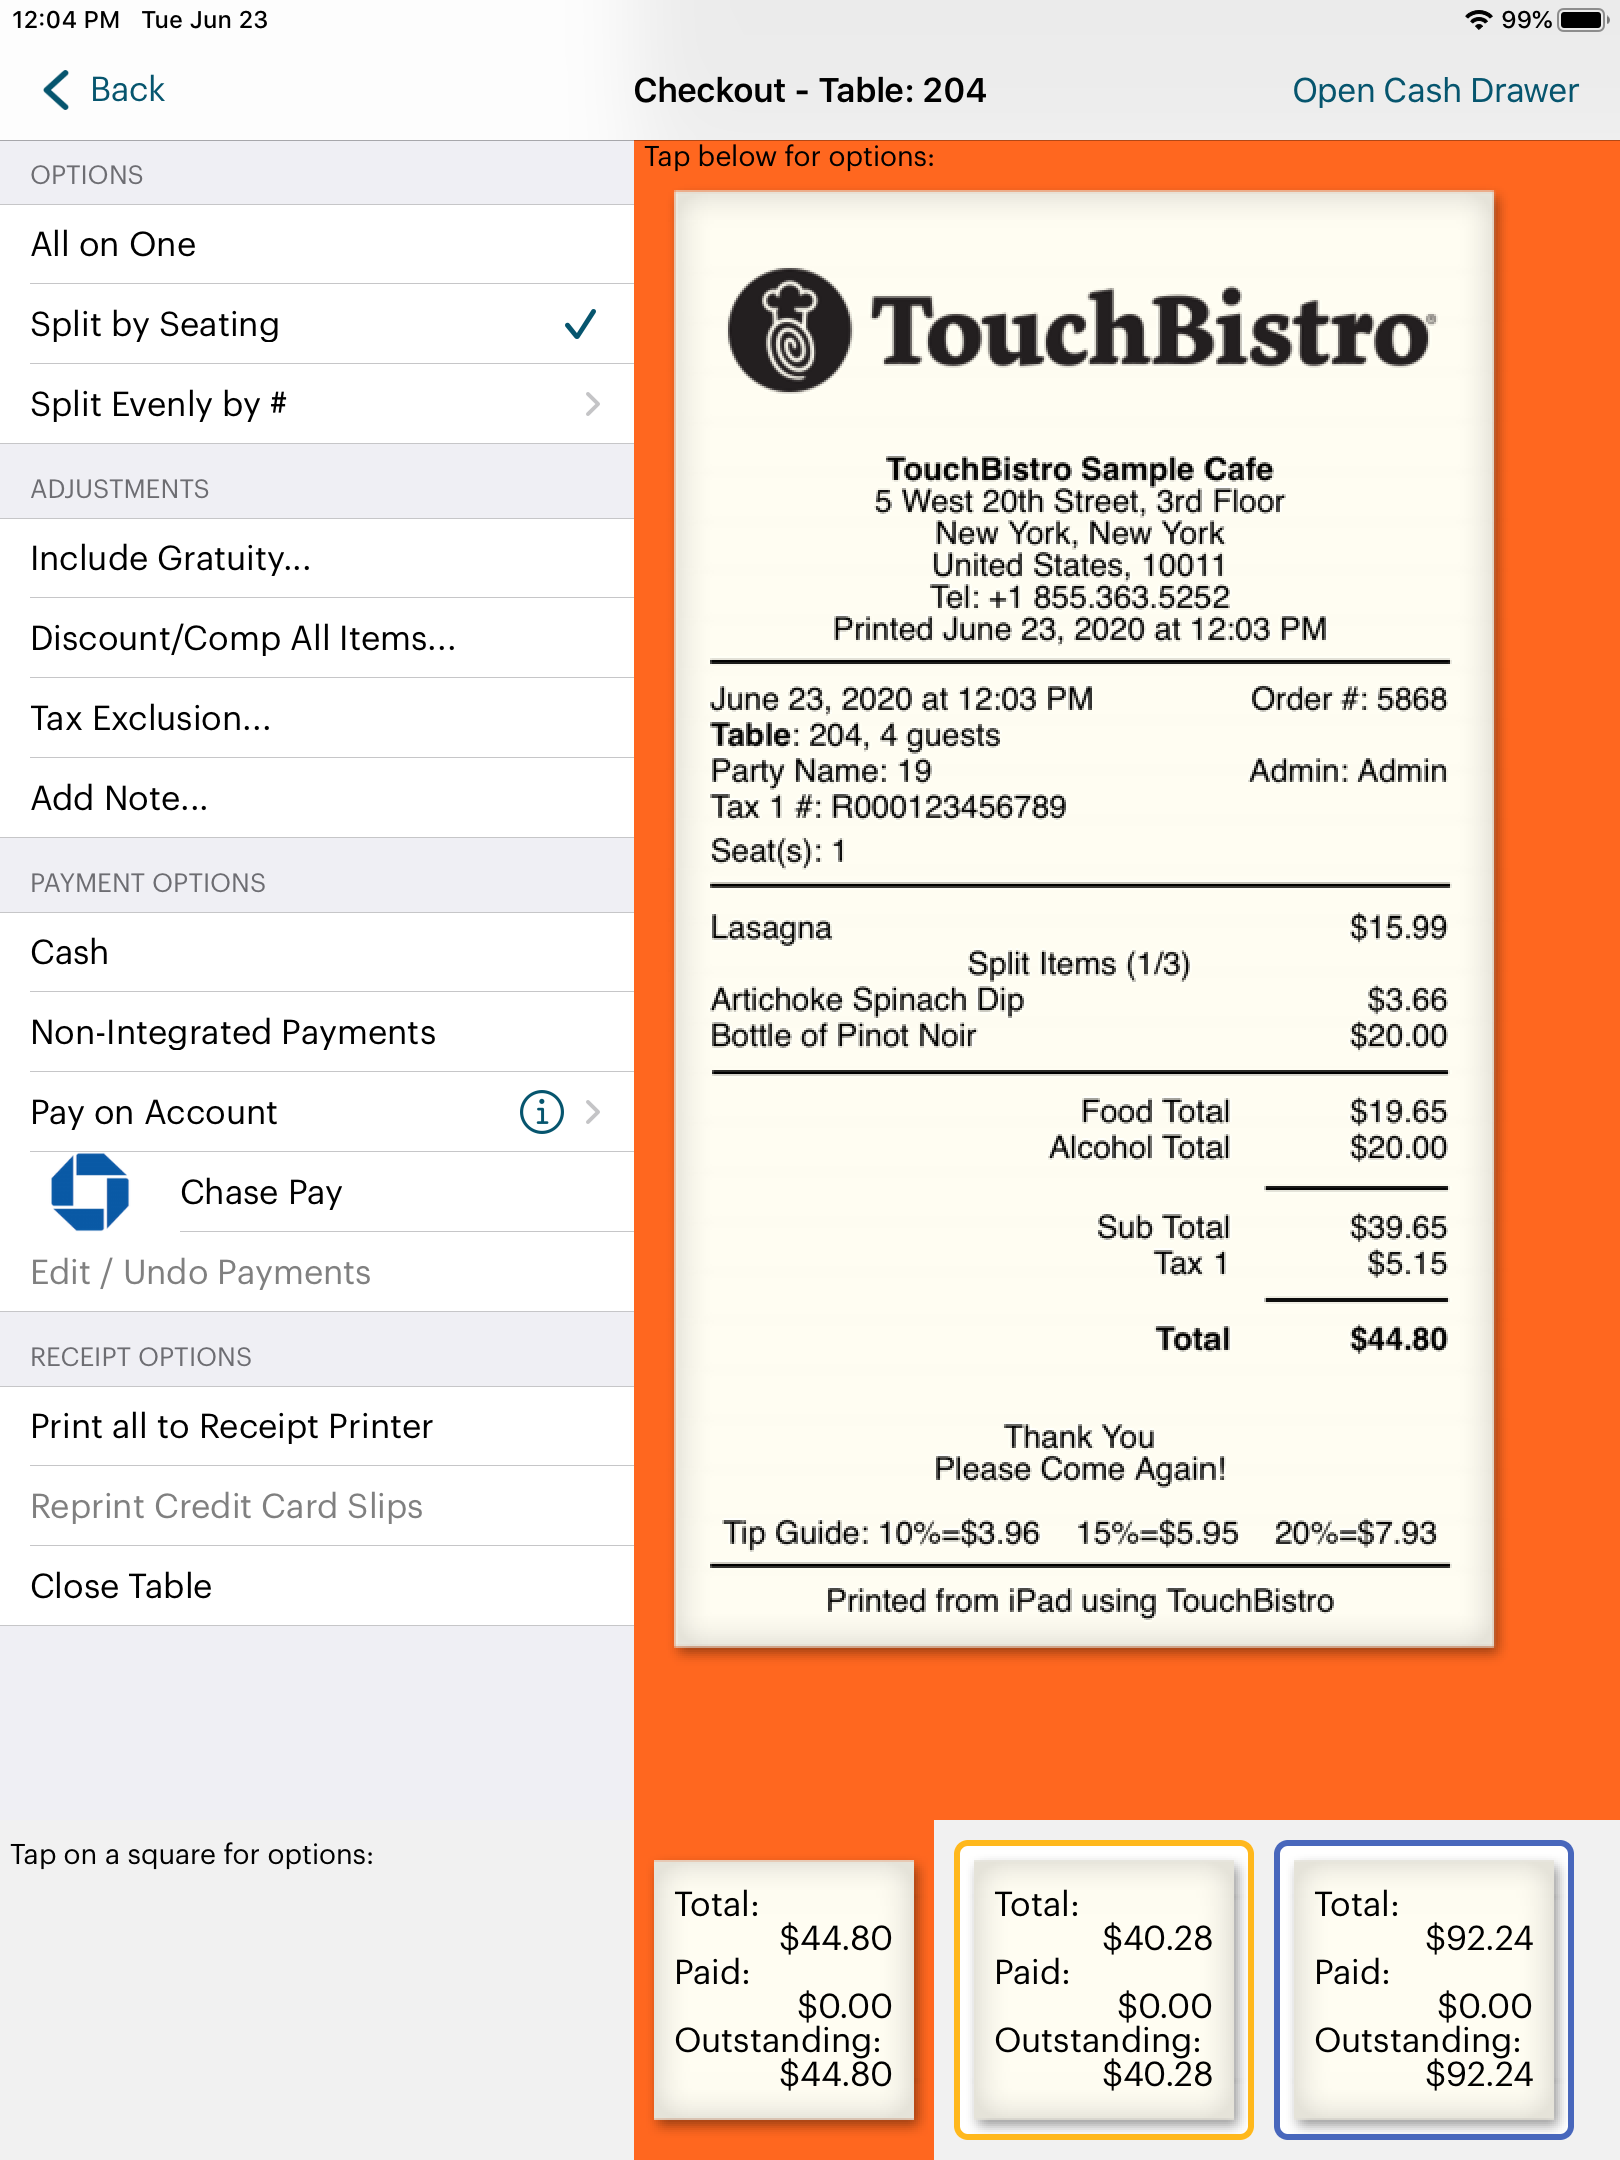 TouchBistro Check Out